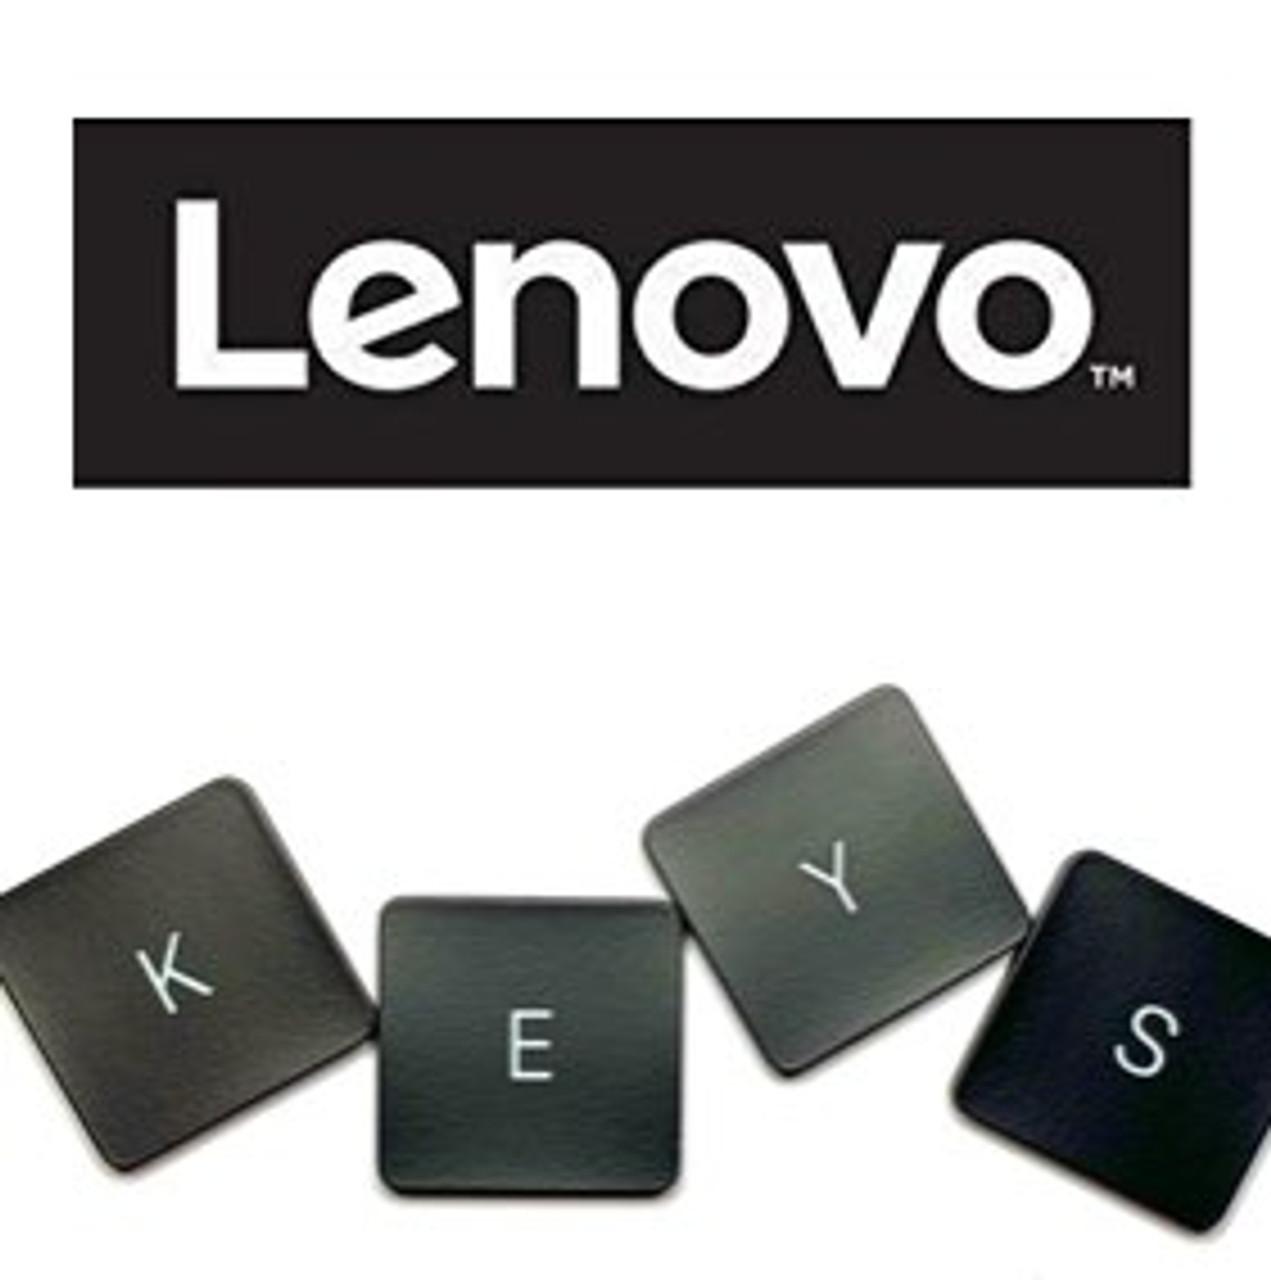 Lenovo L340 15api Keyboard Key Replacement